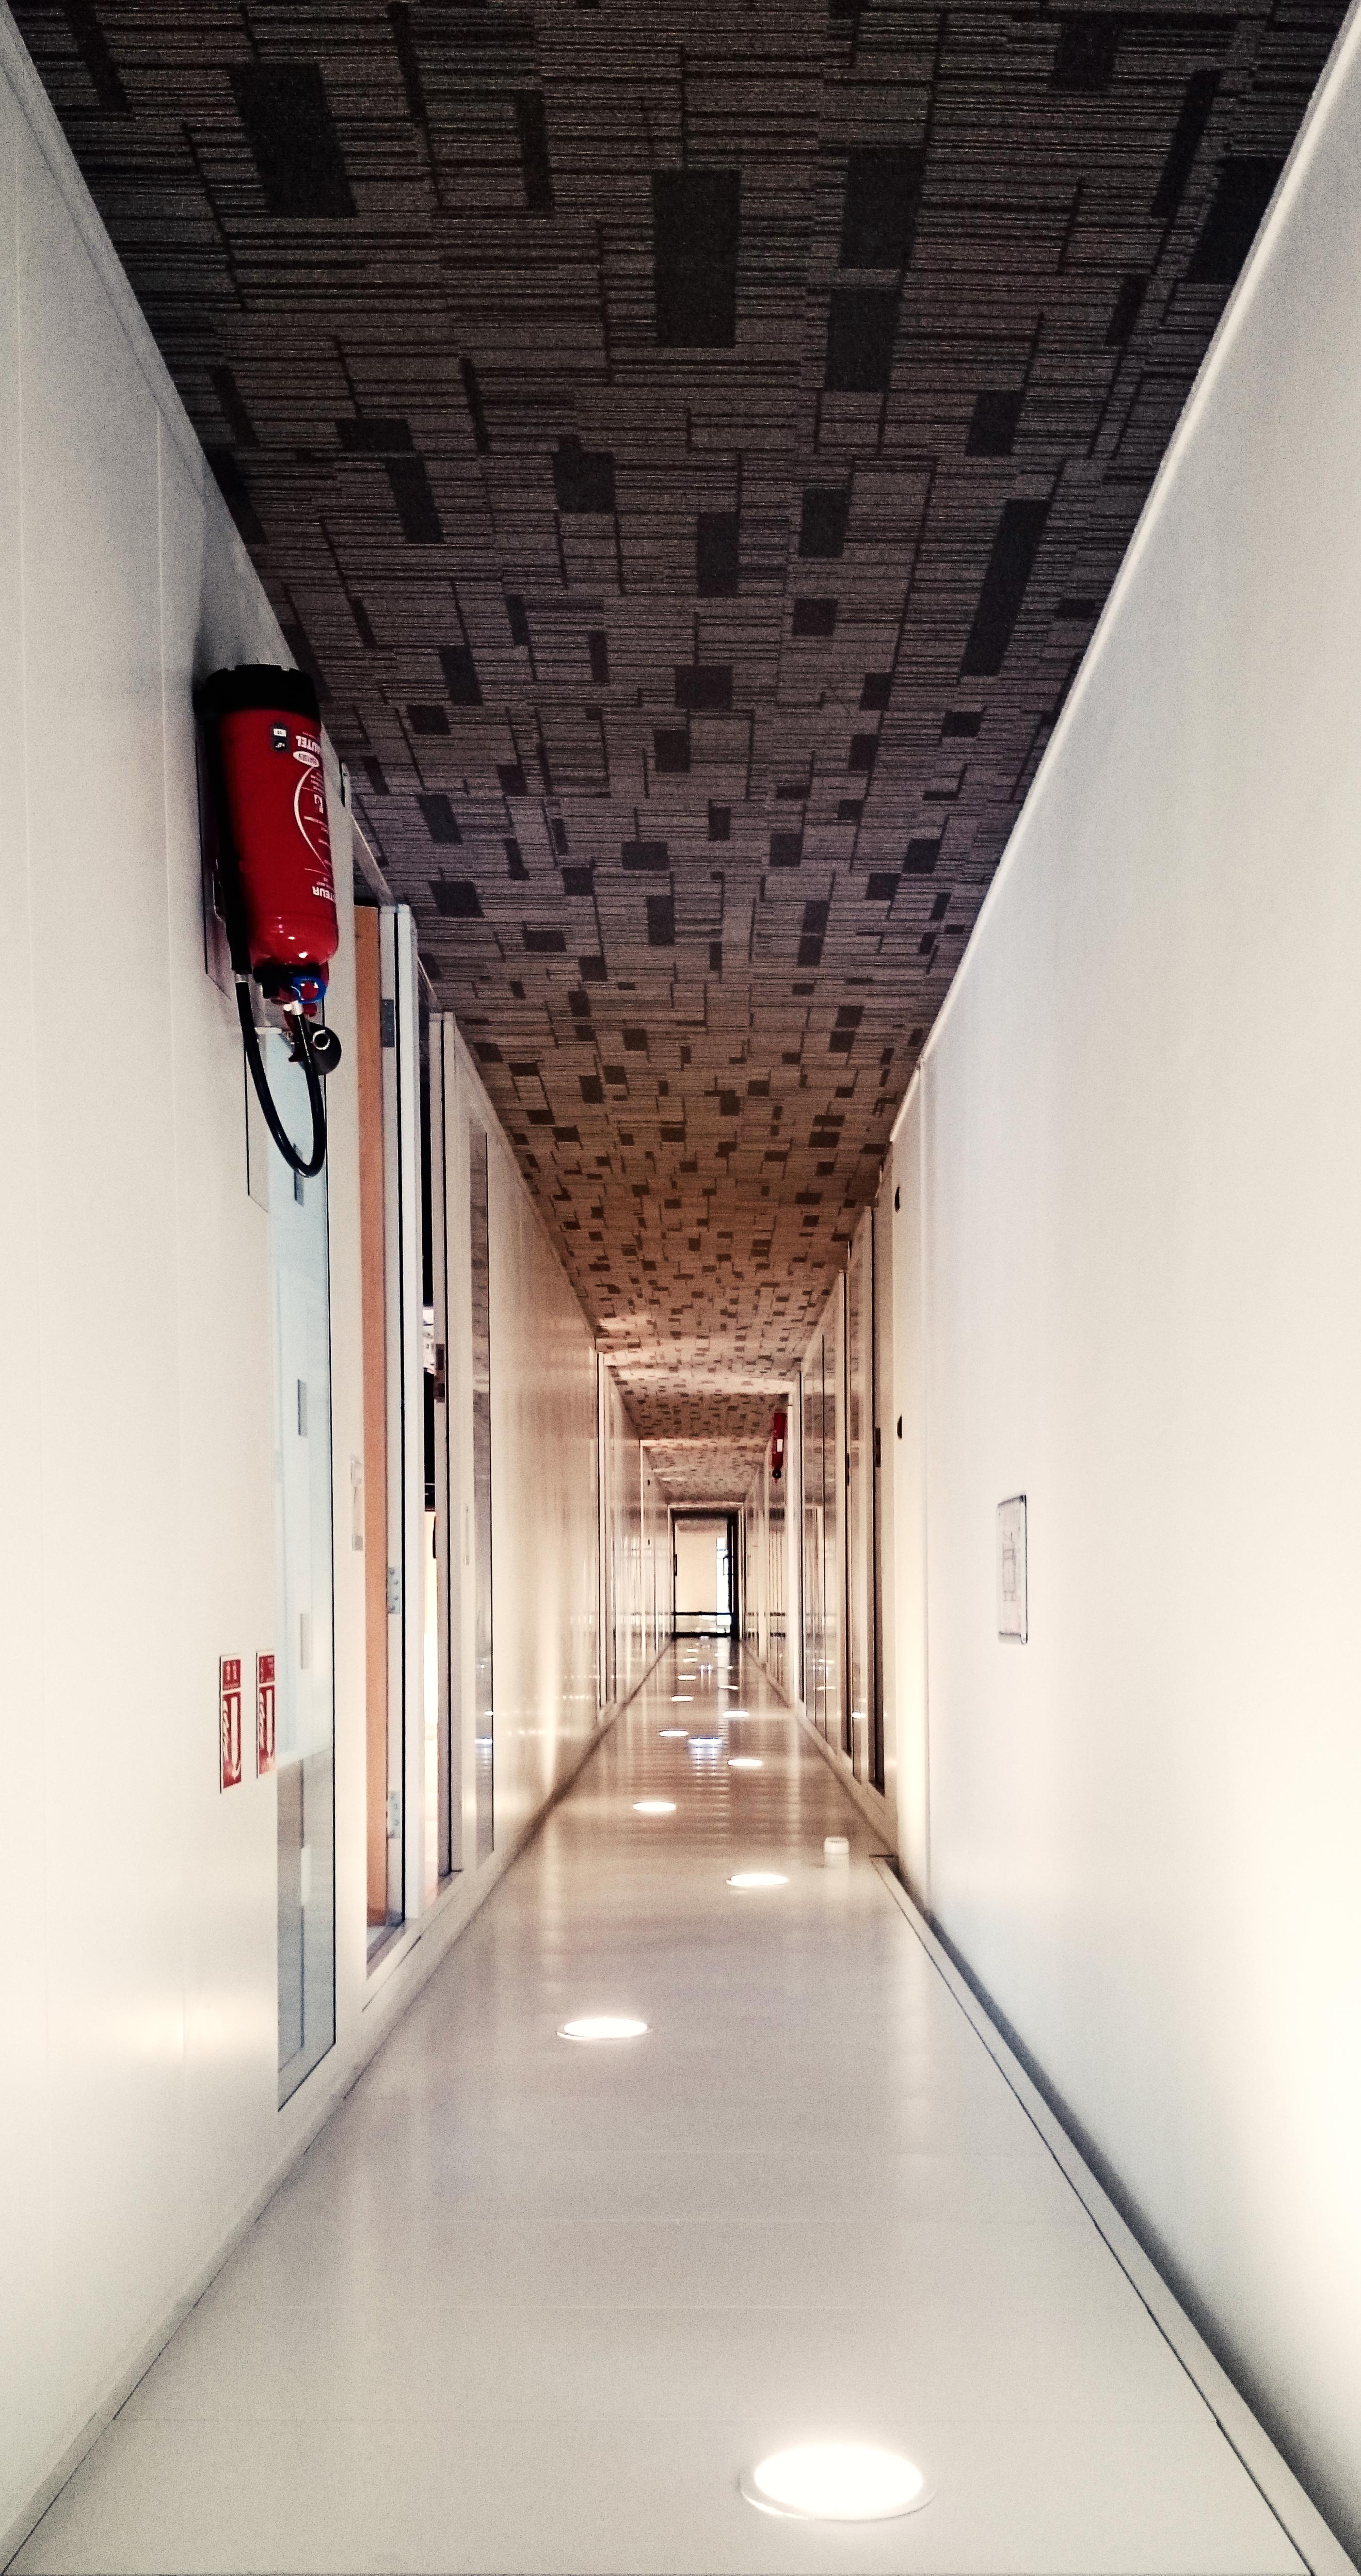 Line Geometry Hall Indoor Endless Professional Interior Design Creativecommons Cc0 Publicdomain Symmetry Nocopyright Ccby Geometrie Blanc